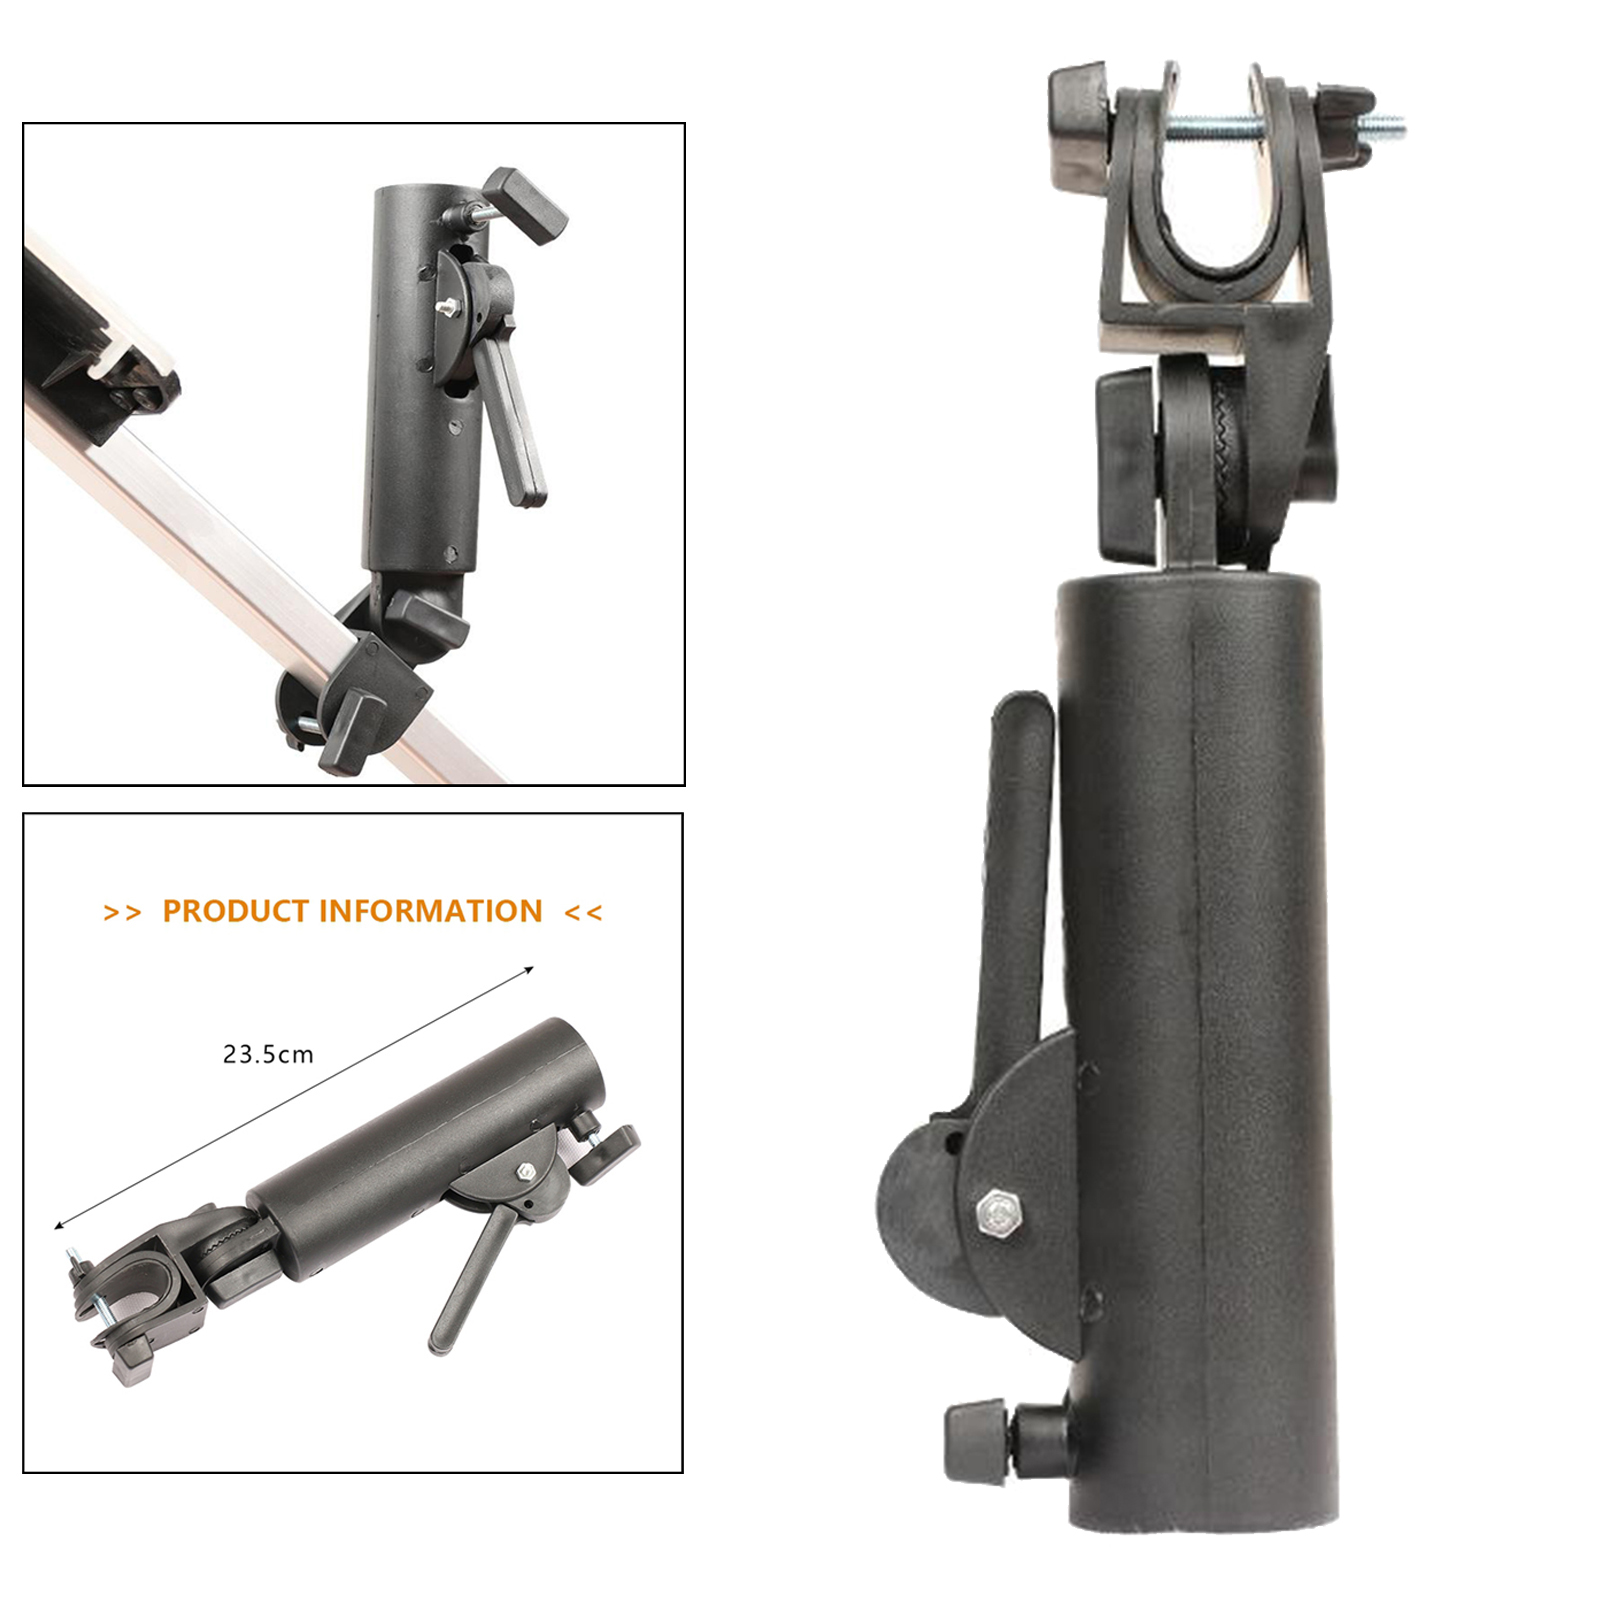 Angle Ajustable Swivel Double Lock Golf Club Trolley Pushchair Umbrella Holder